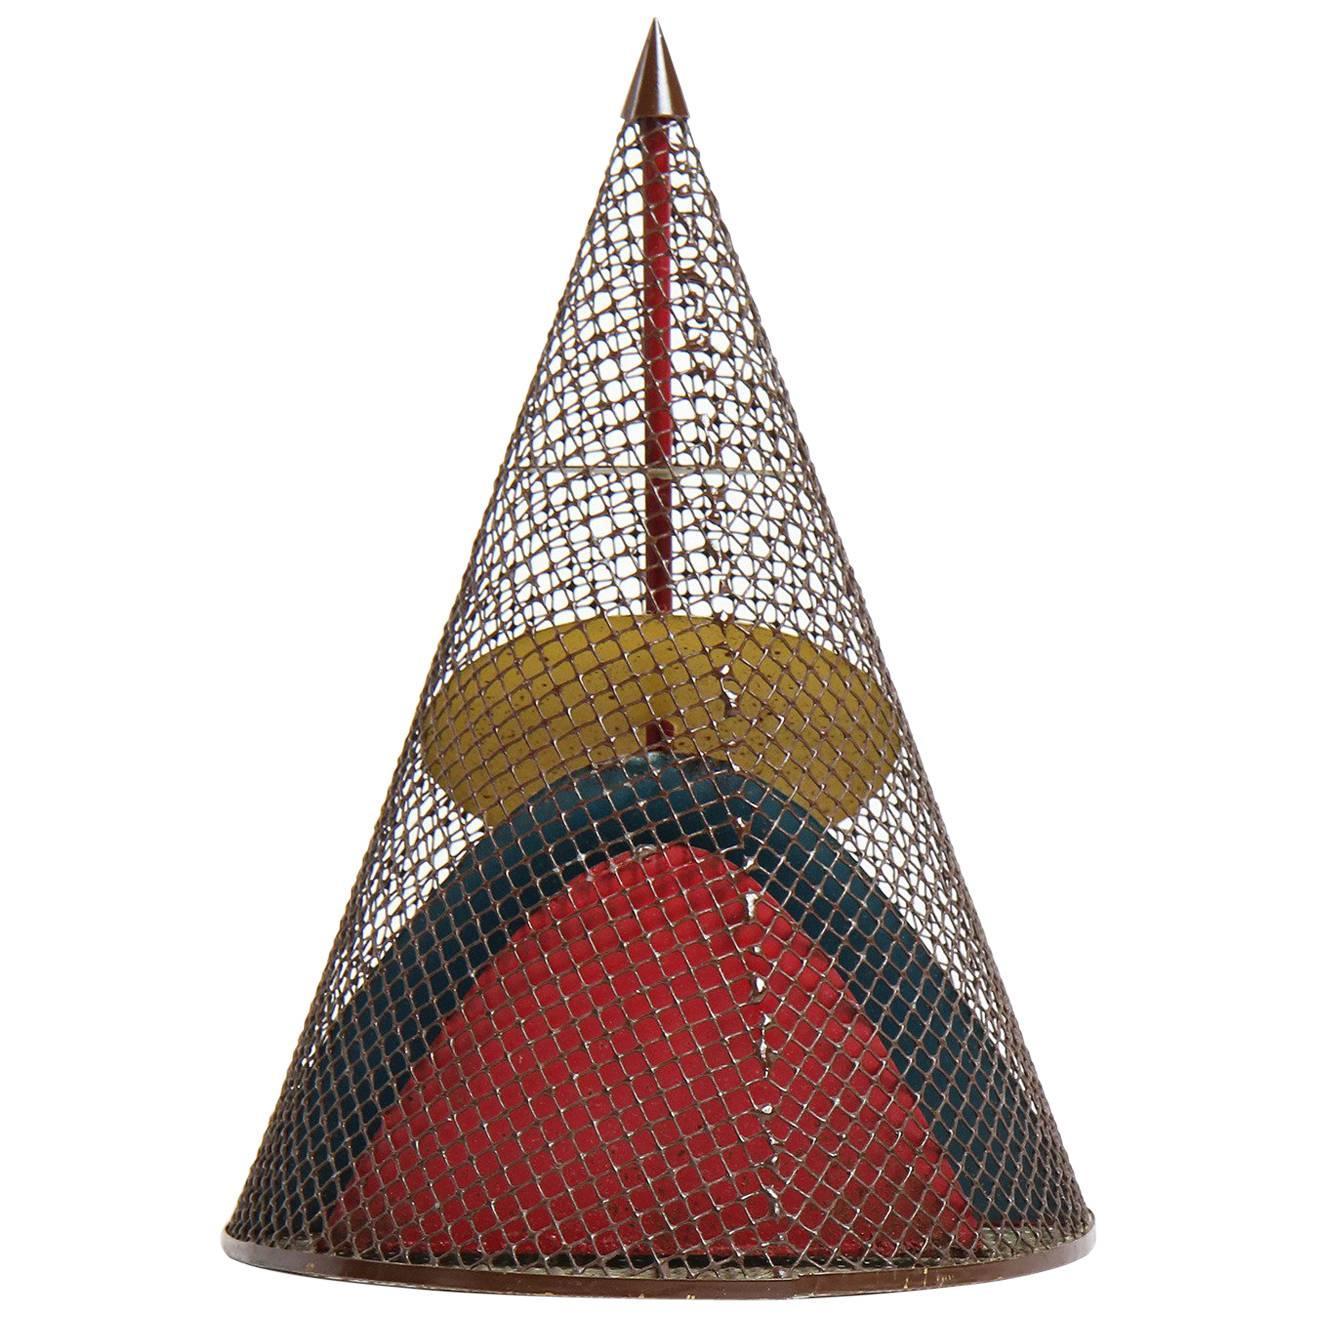 Conical Metal Sculpture